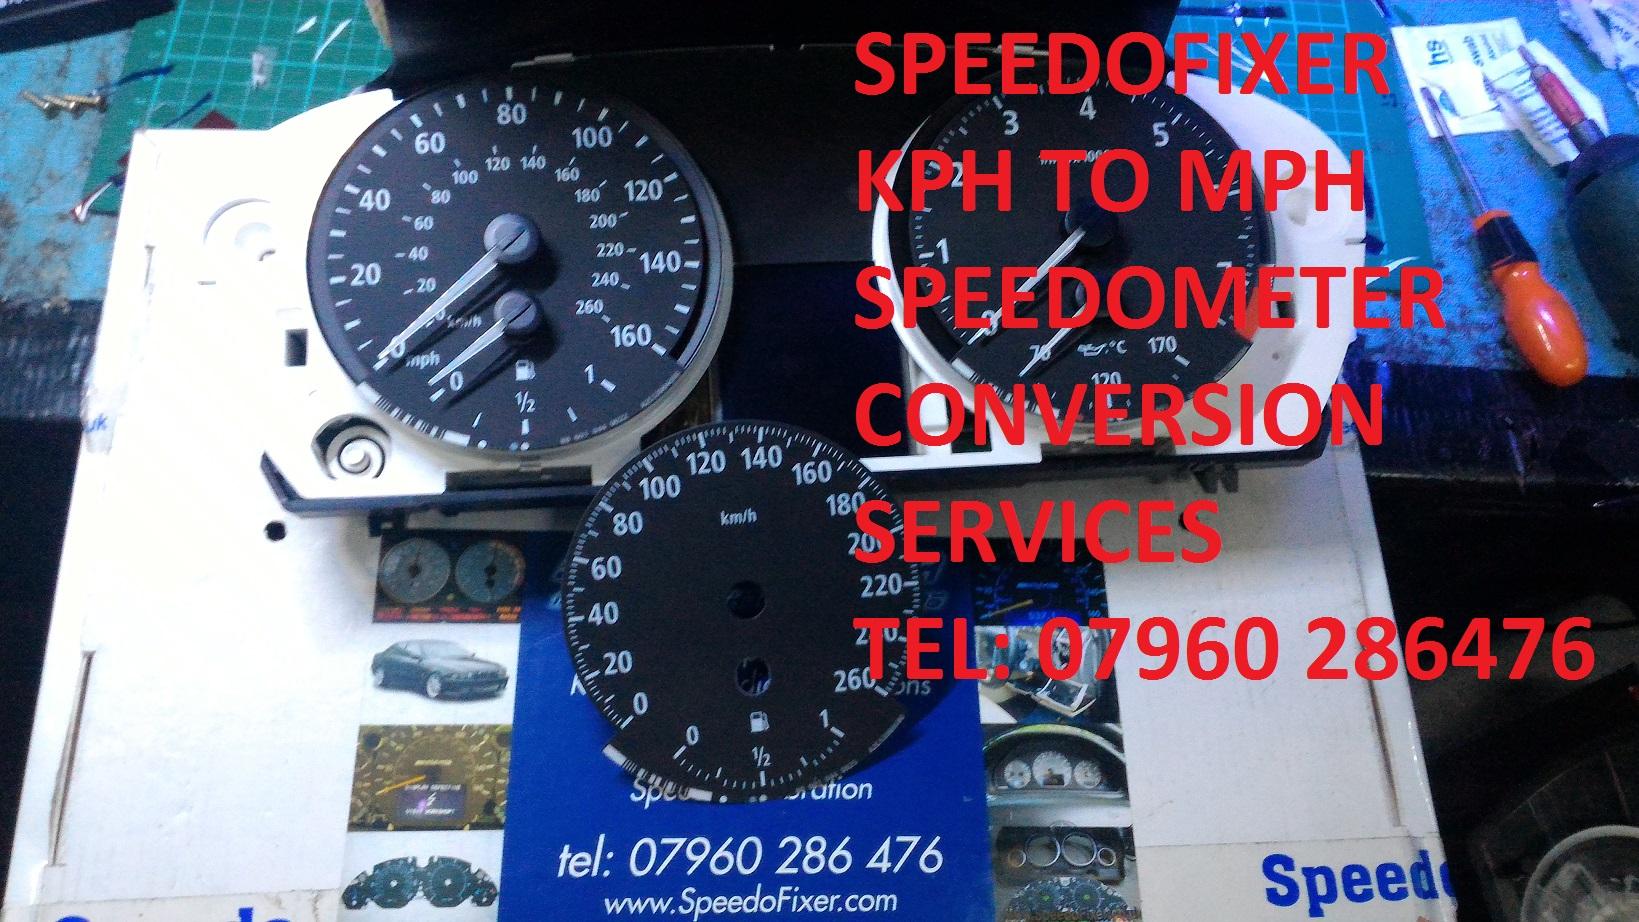 bmw 6 series kph mph speedometer conversion. Black Bedroom Furniture Sets. Home Design Ideas